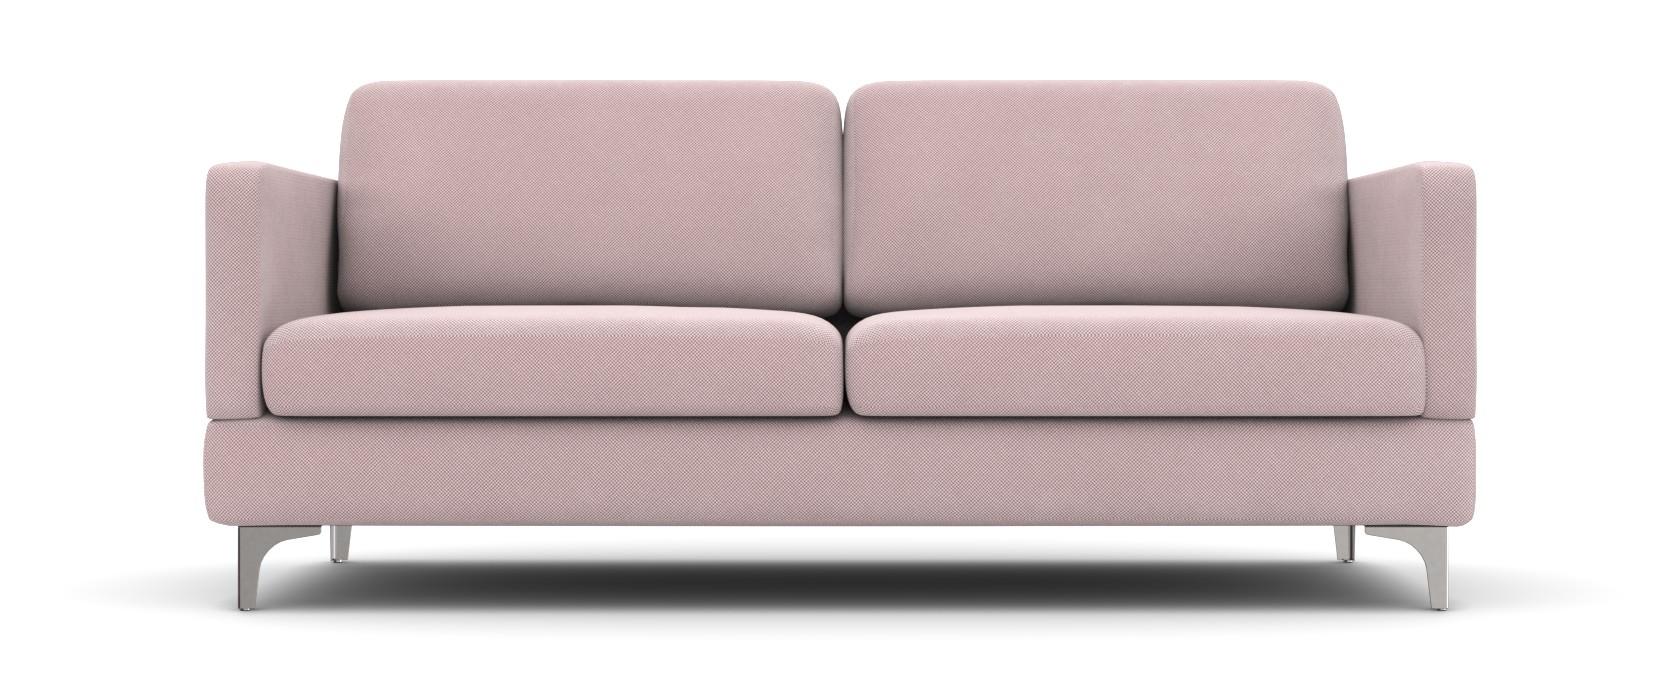 3-Sitzer Sofa Manfredo Club